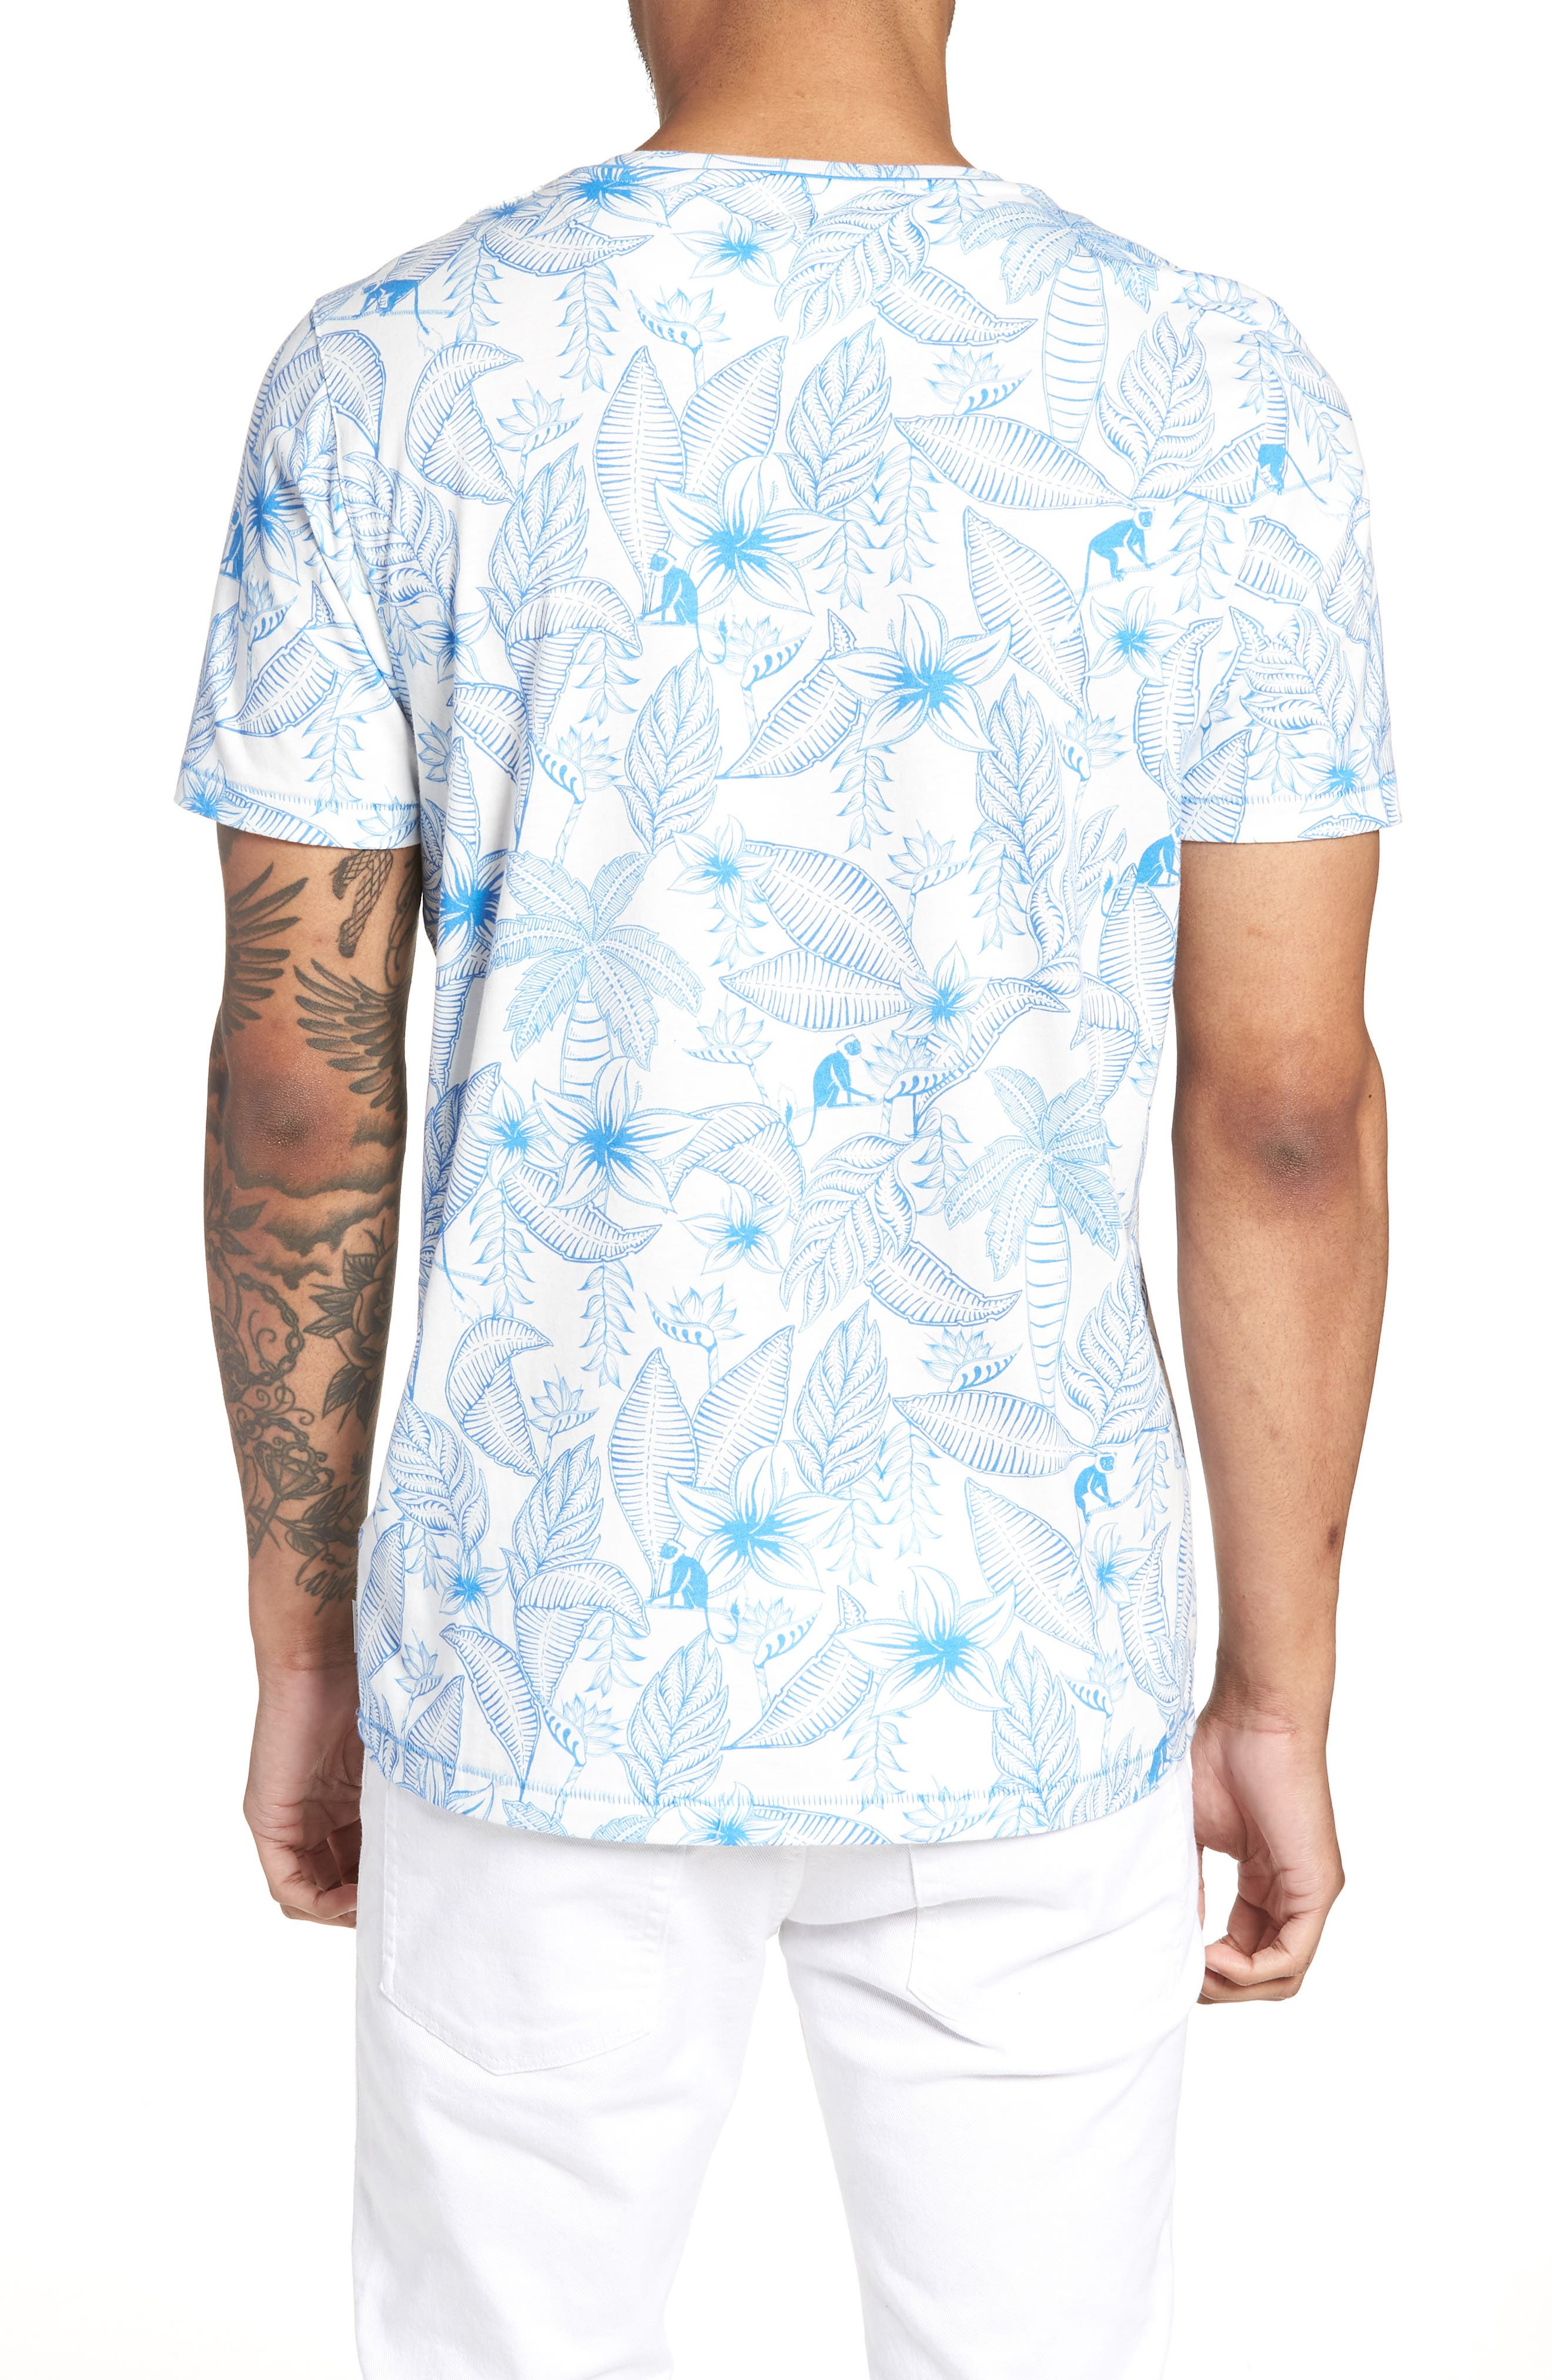 Bengel Crewneck T-Shirt,                             Alternate thumbnail 2, color,                             BRIGHT BLUE